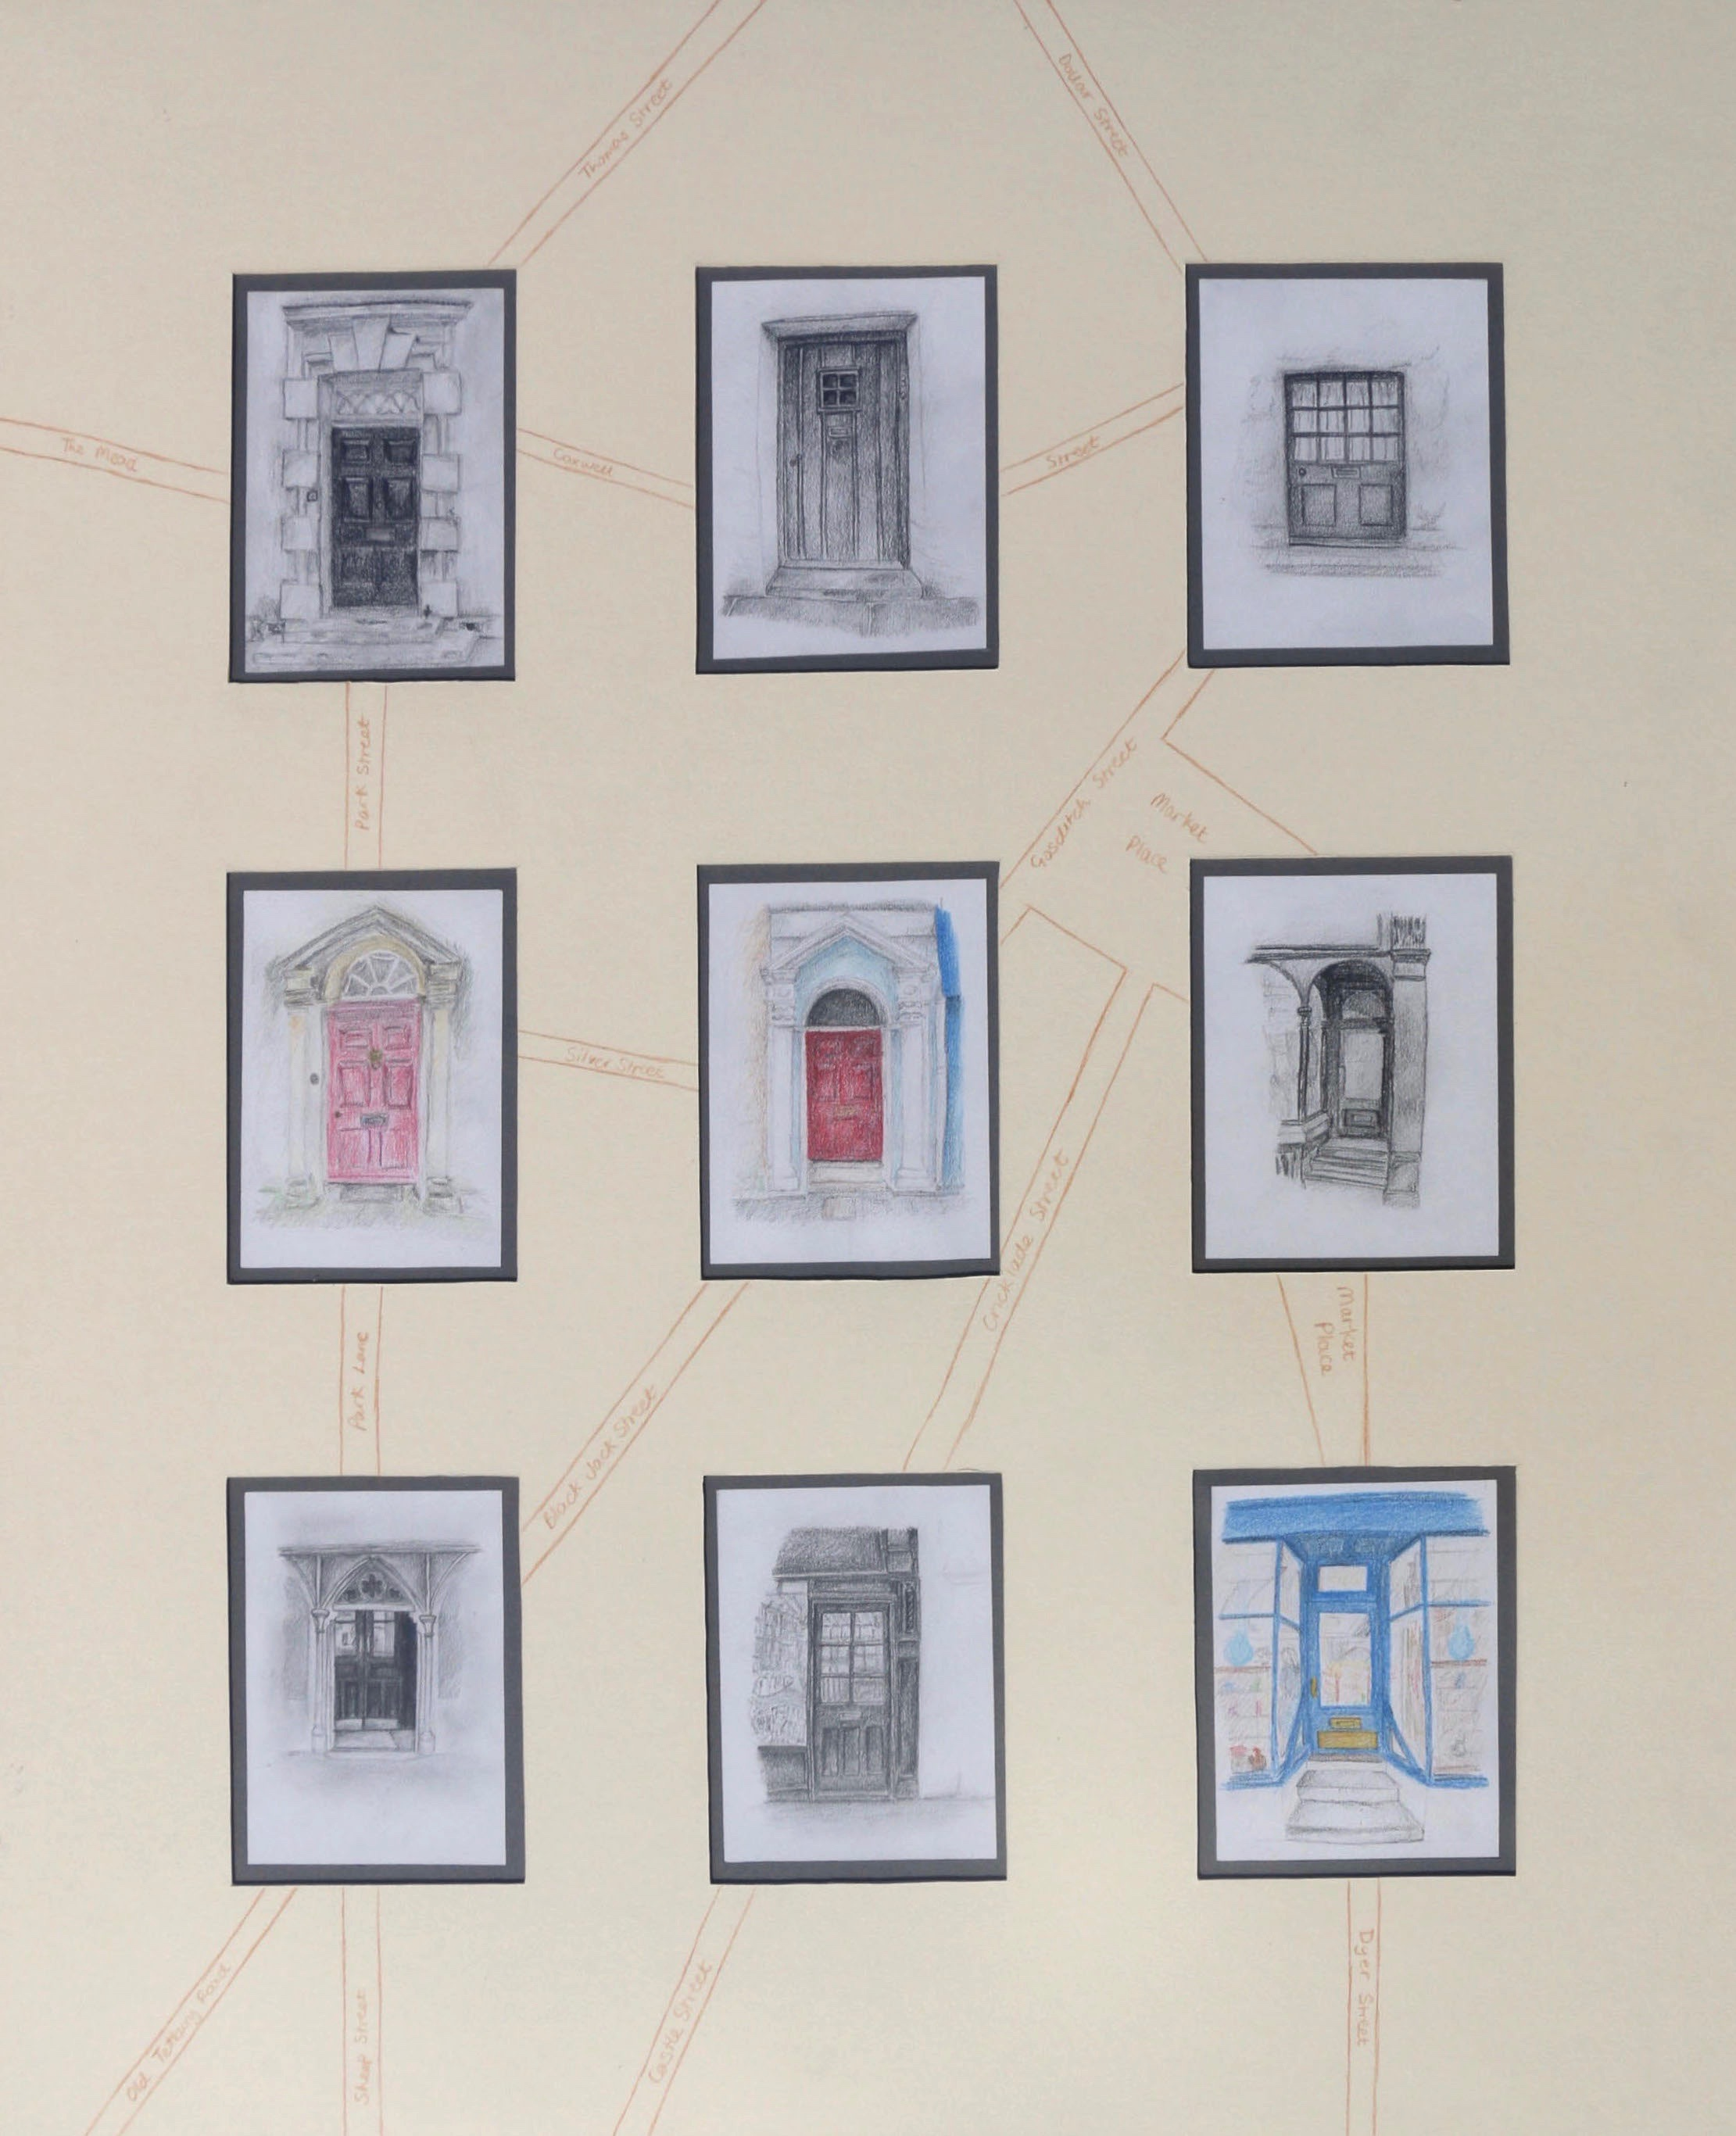 Cirencester Doors